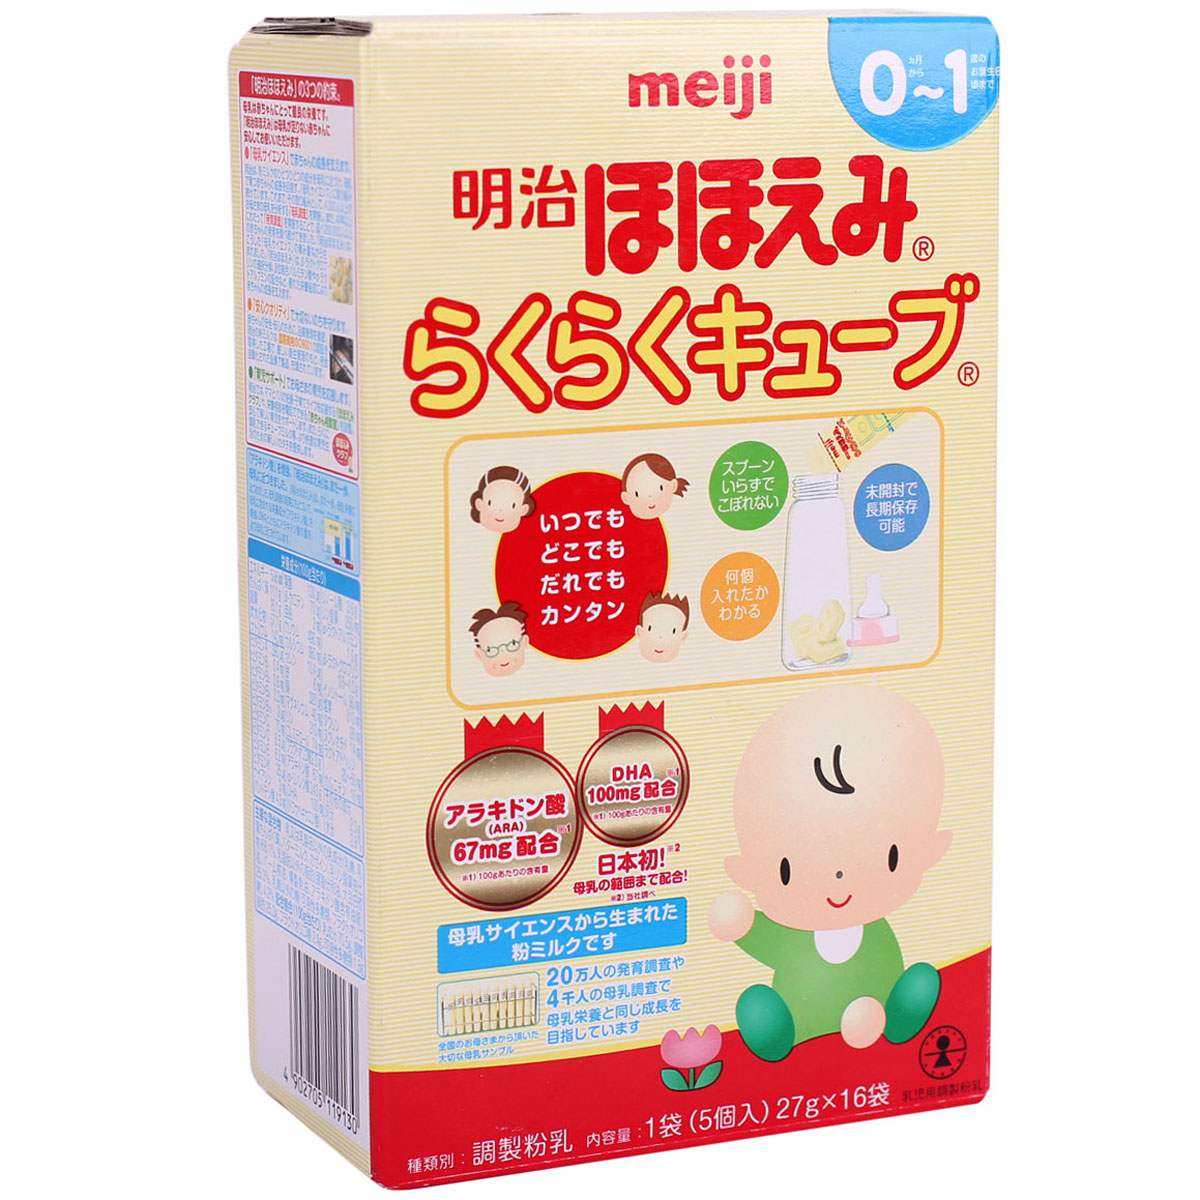 Sua Meiji so 0 Nhat Ban dang thanh (16 thanh)